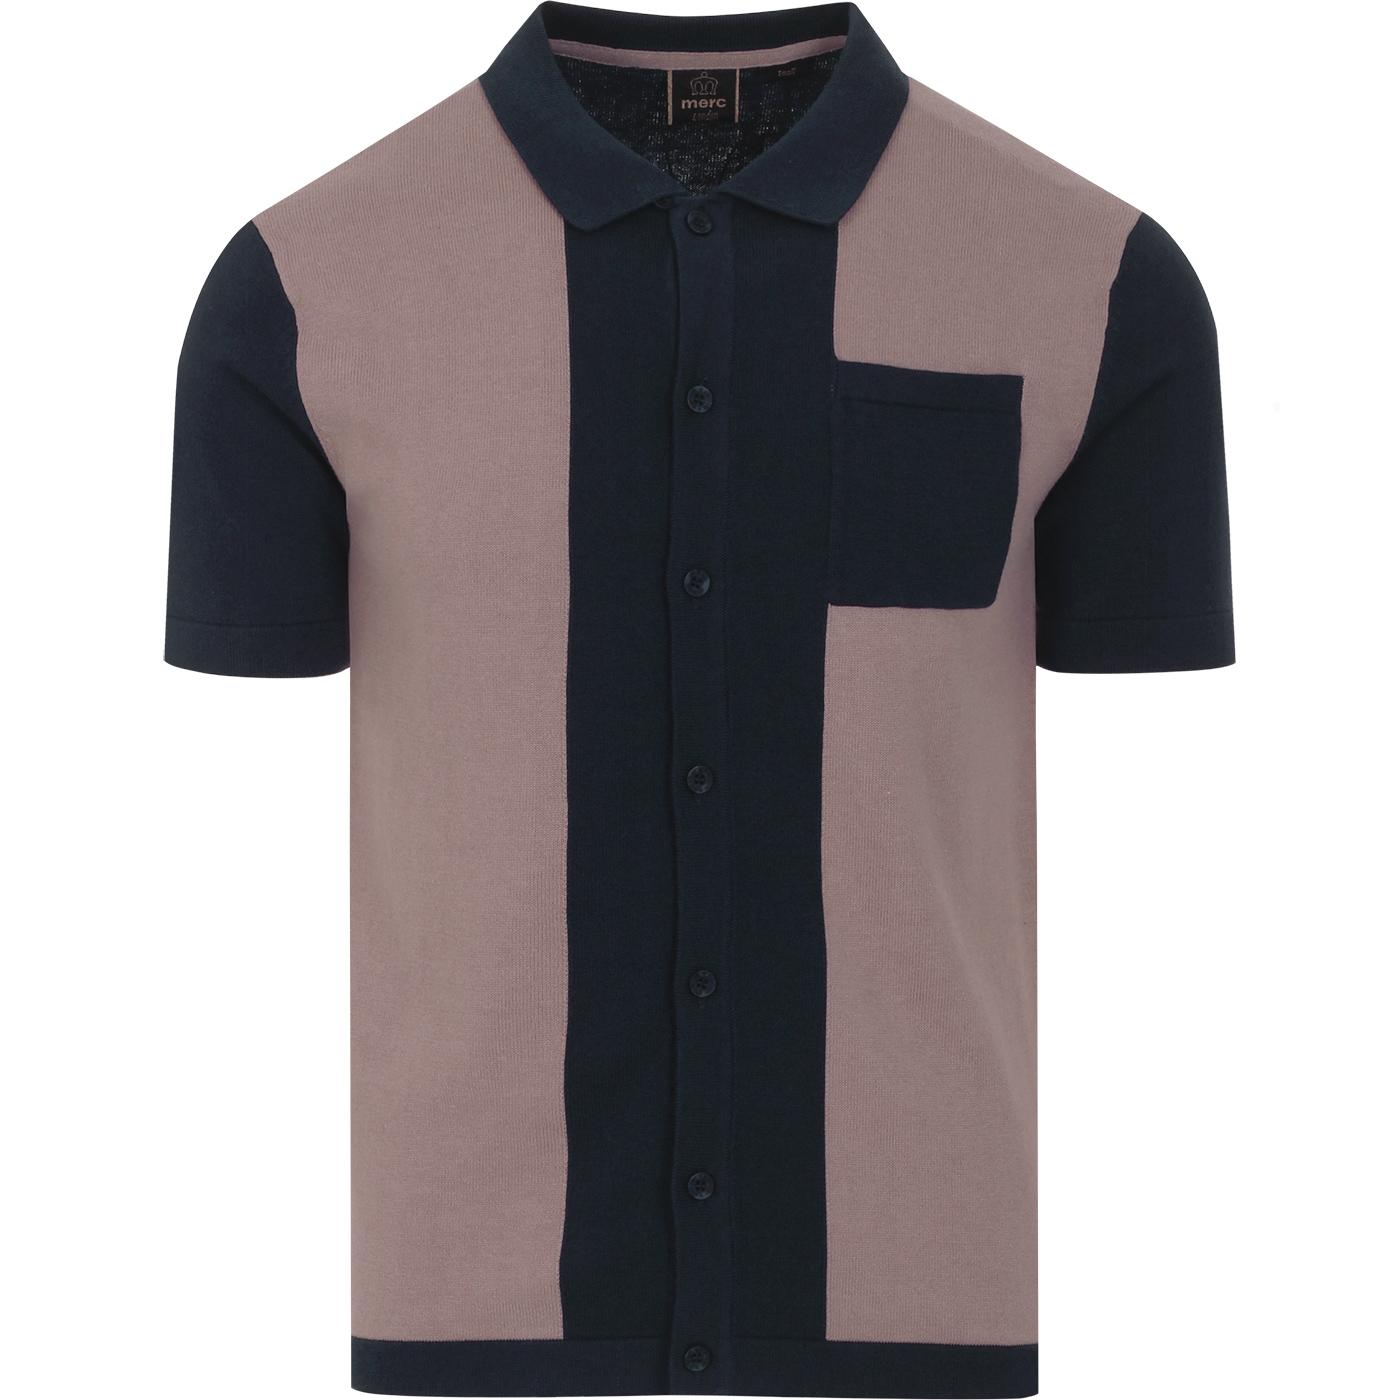 Conduit MERC 60s Mod Panel Knit Polo Cardigan (DB)